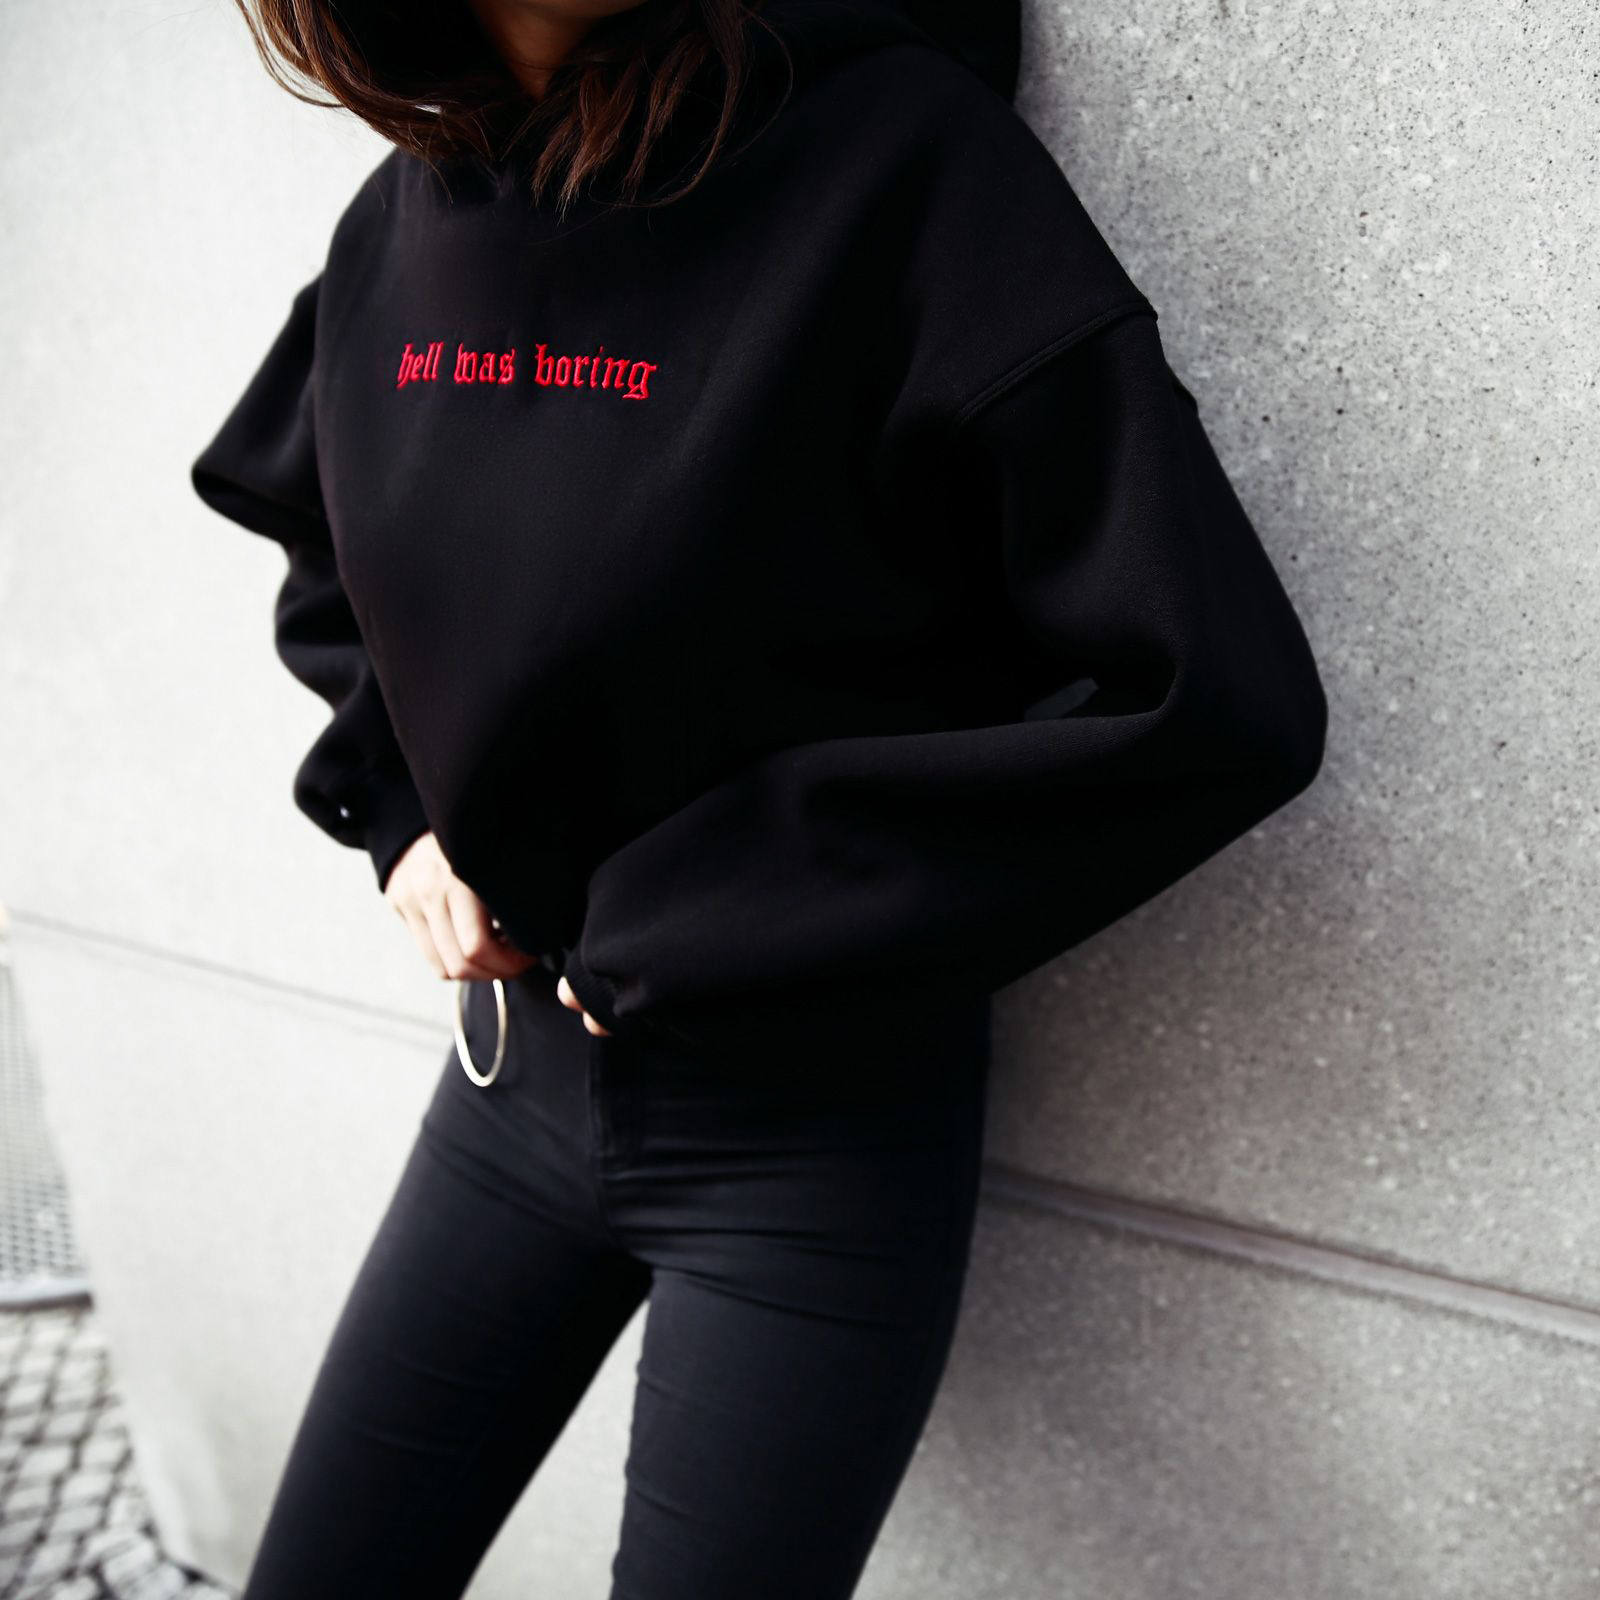 Hell Was Boring Letter Print Hoodie Woman Hooded Sweatshirts Women Funny Tumblr Long Sleeve Pullovers Hoodies